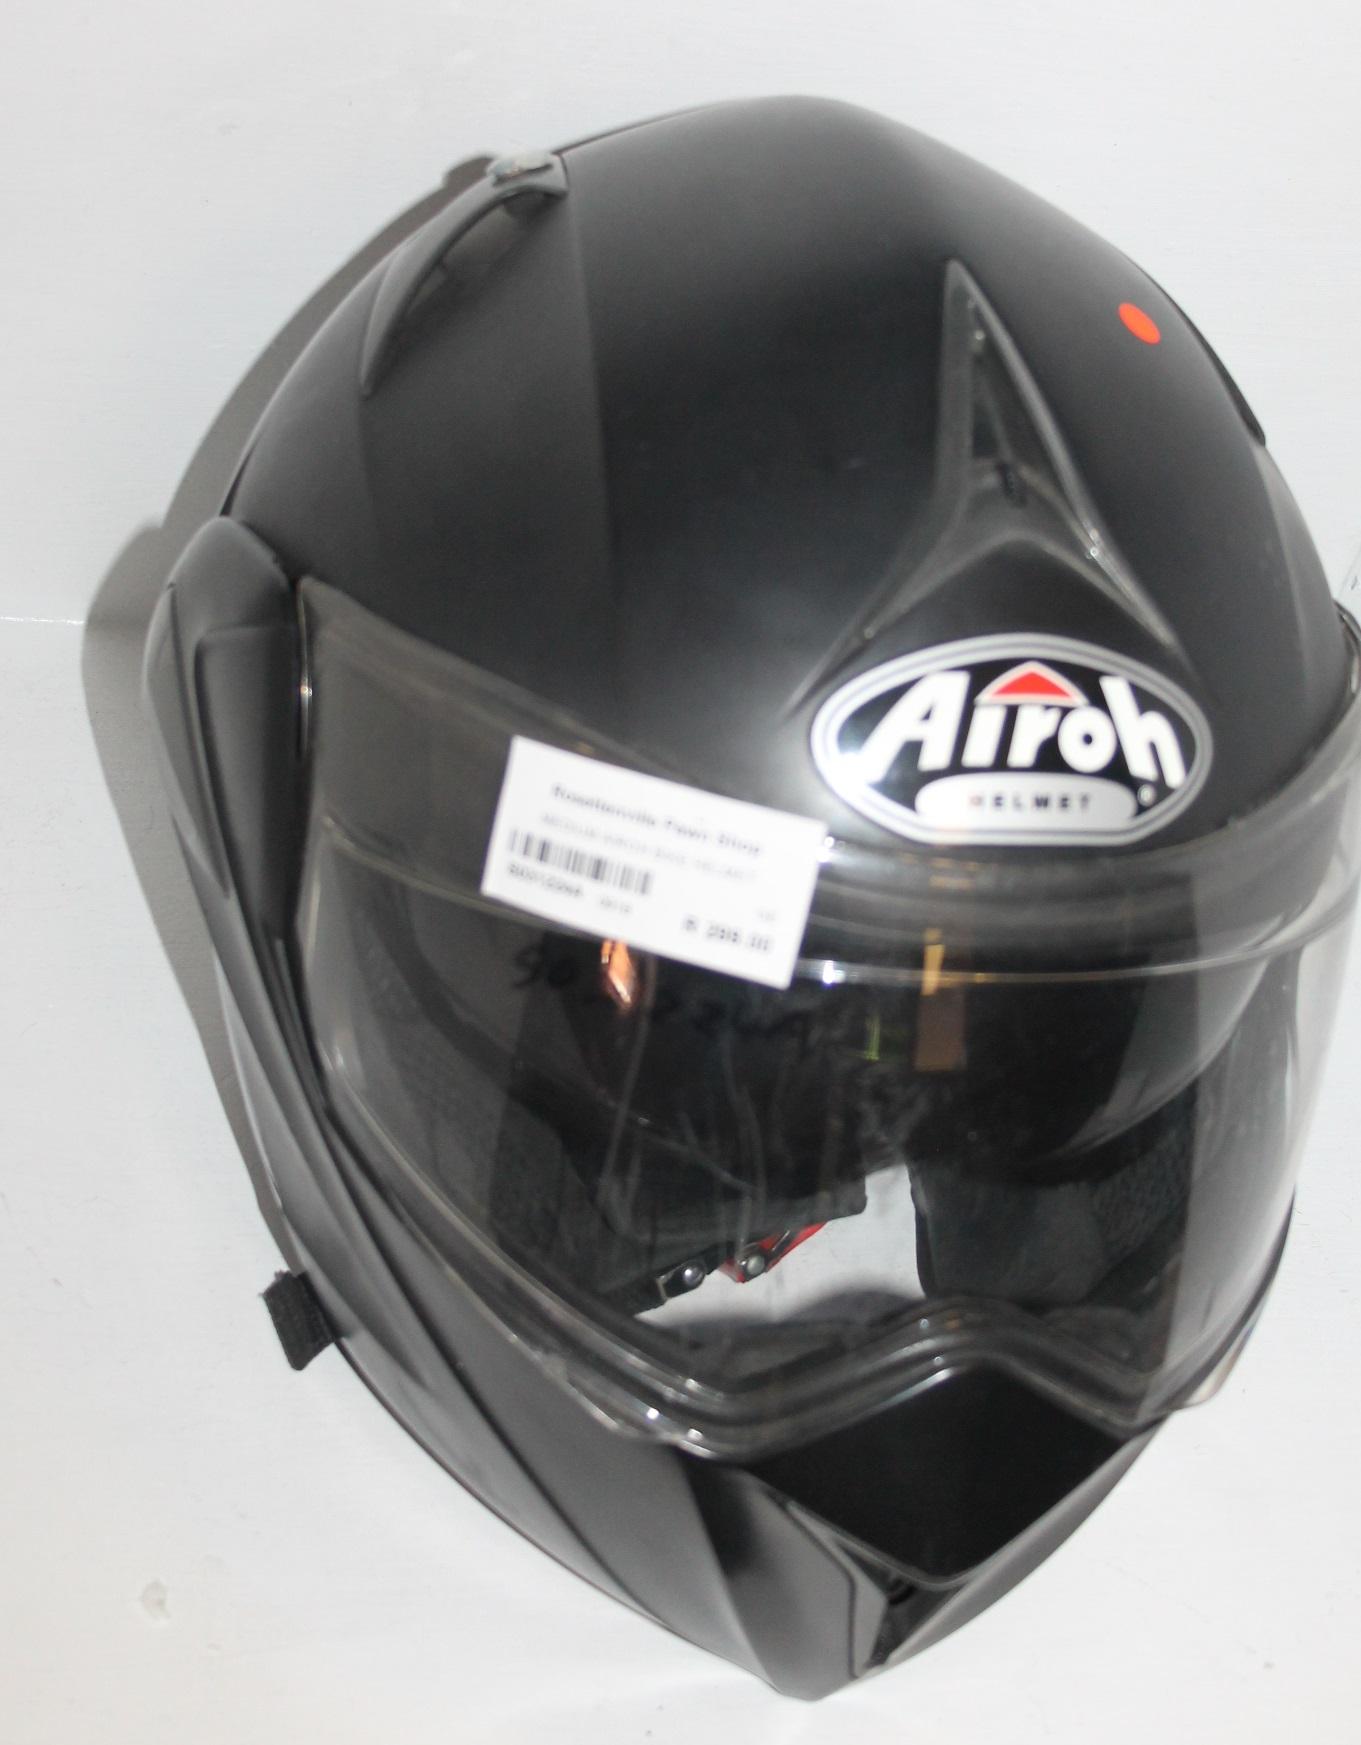 eeecee8e Airoh Street Helmets : Ash Cycles